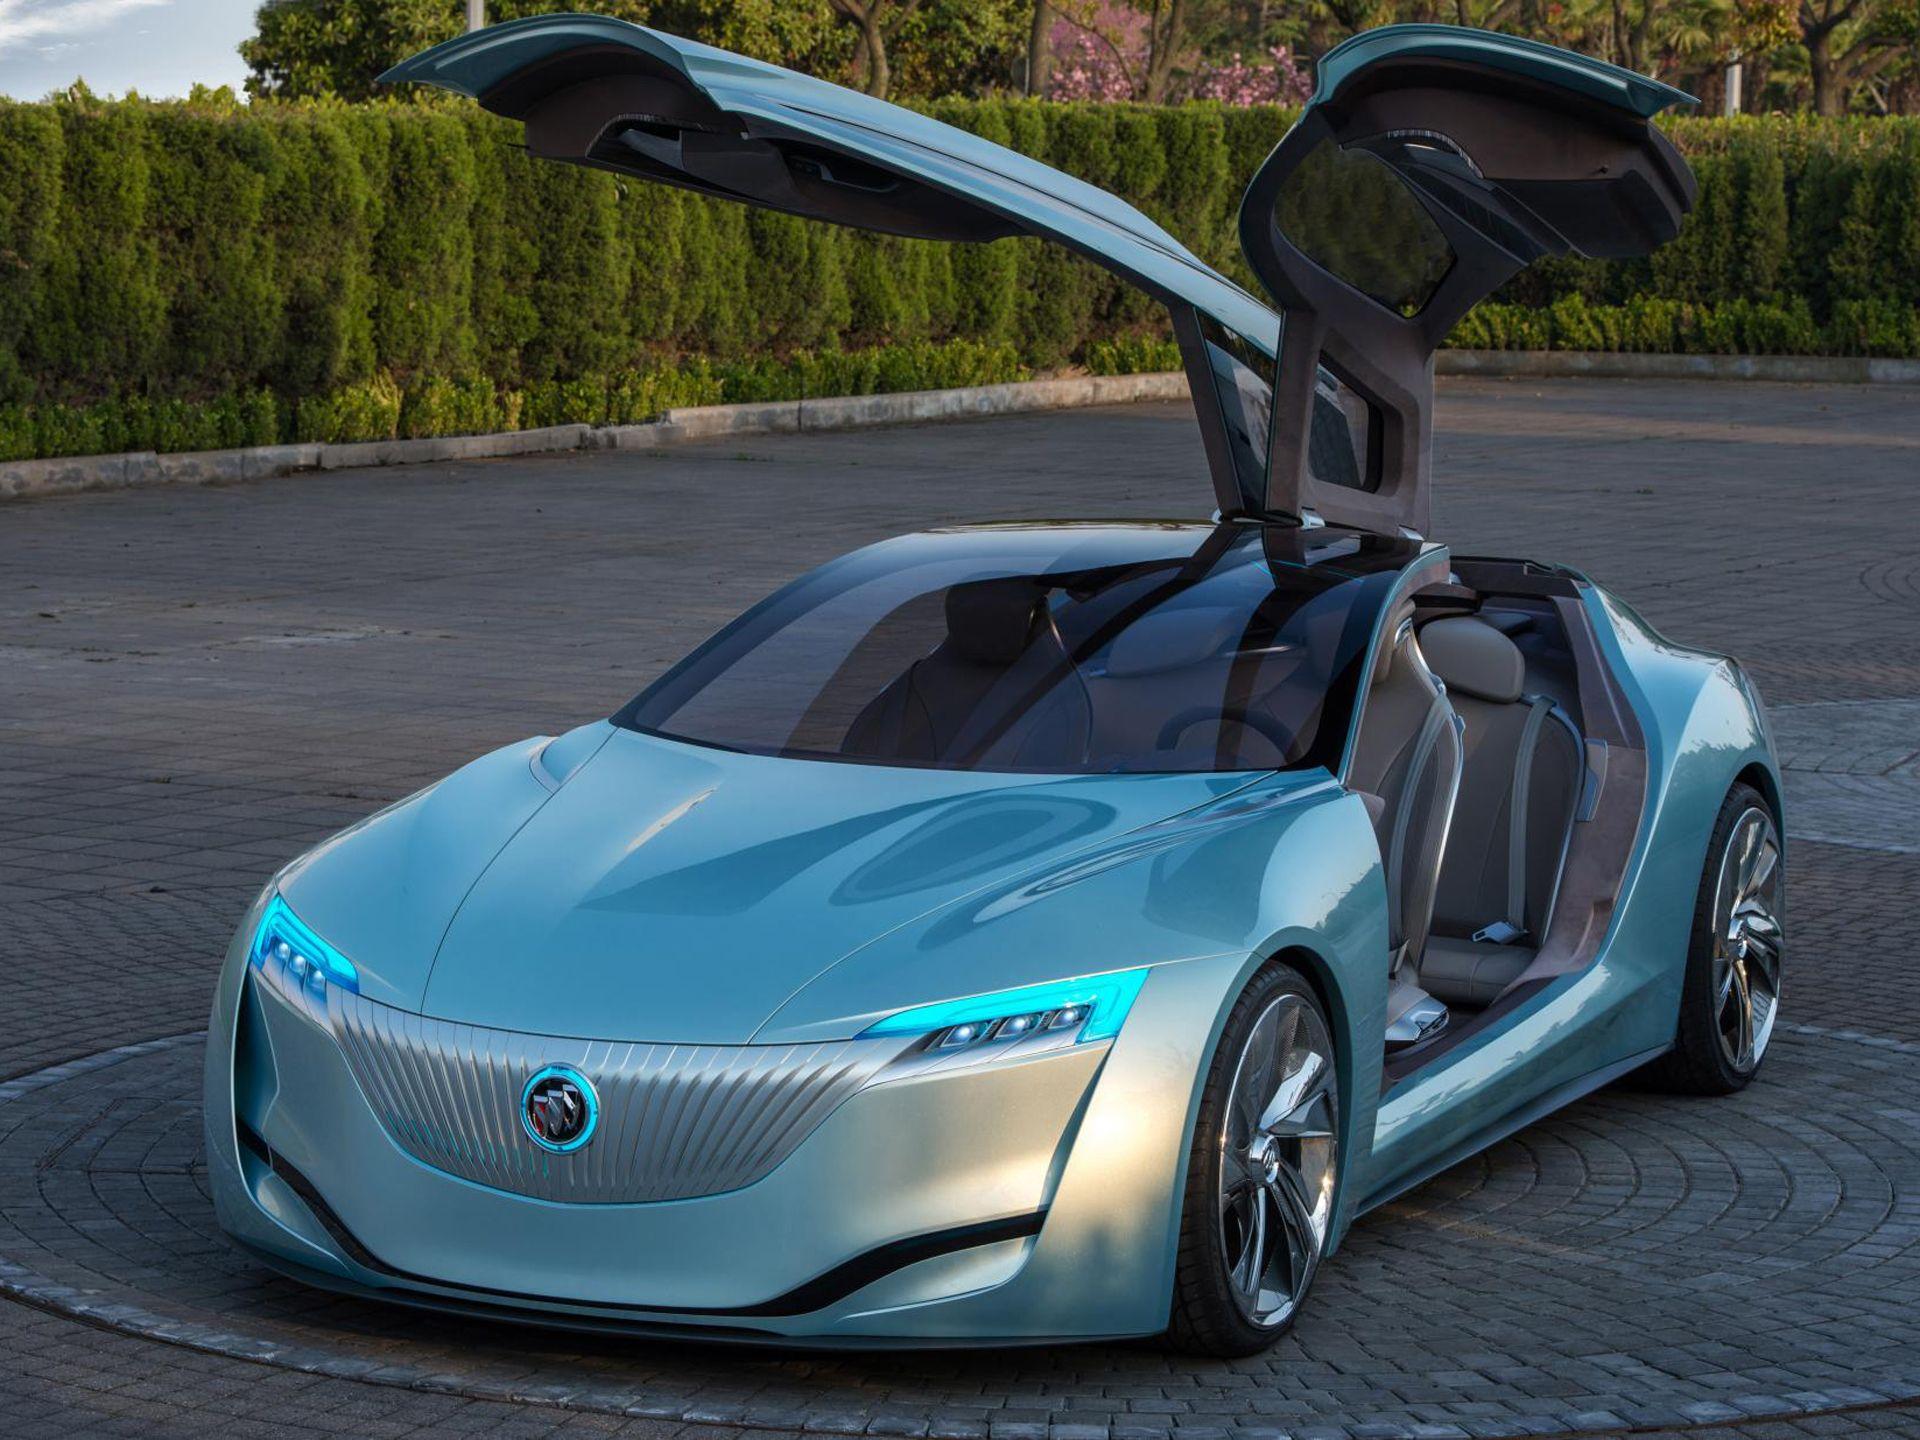 2013 Buick Riviera Coupe Concept   AmcarGuide.com ...